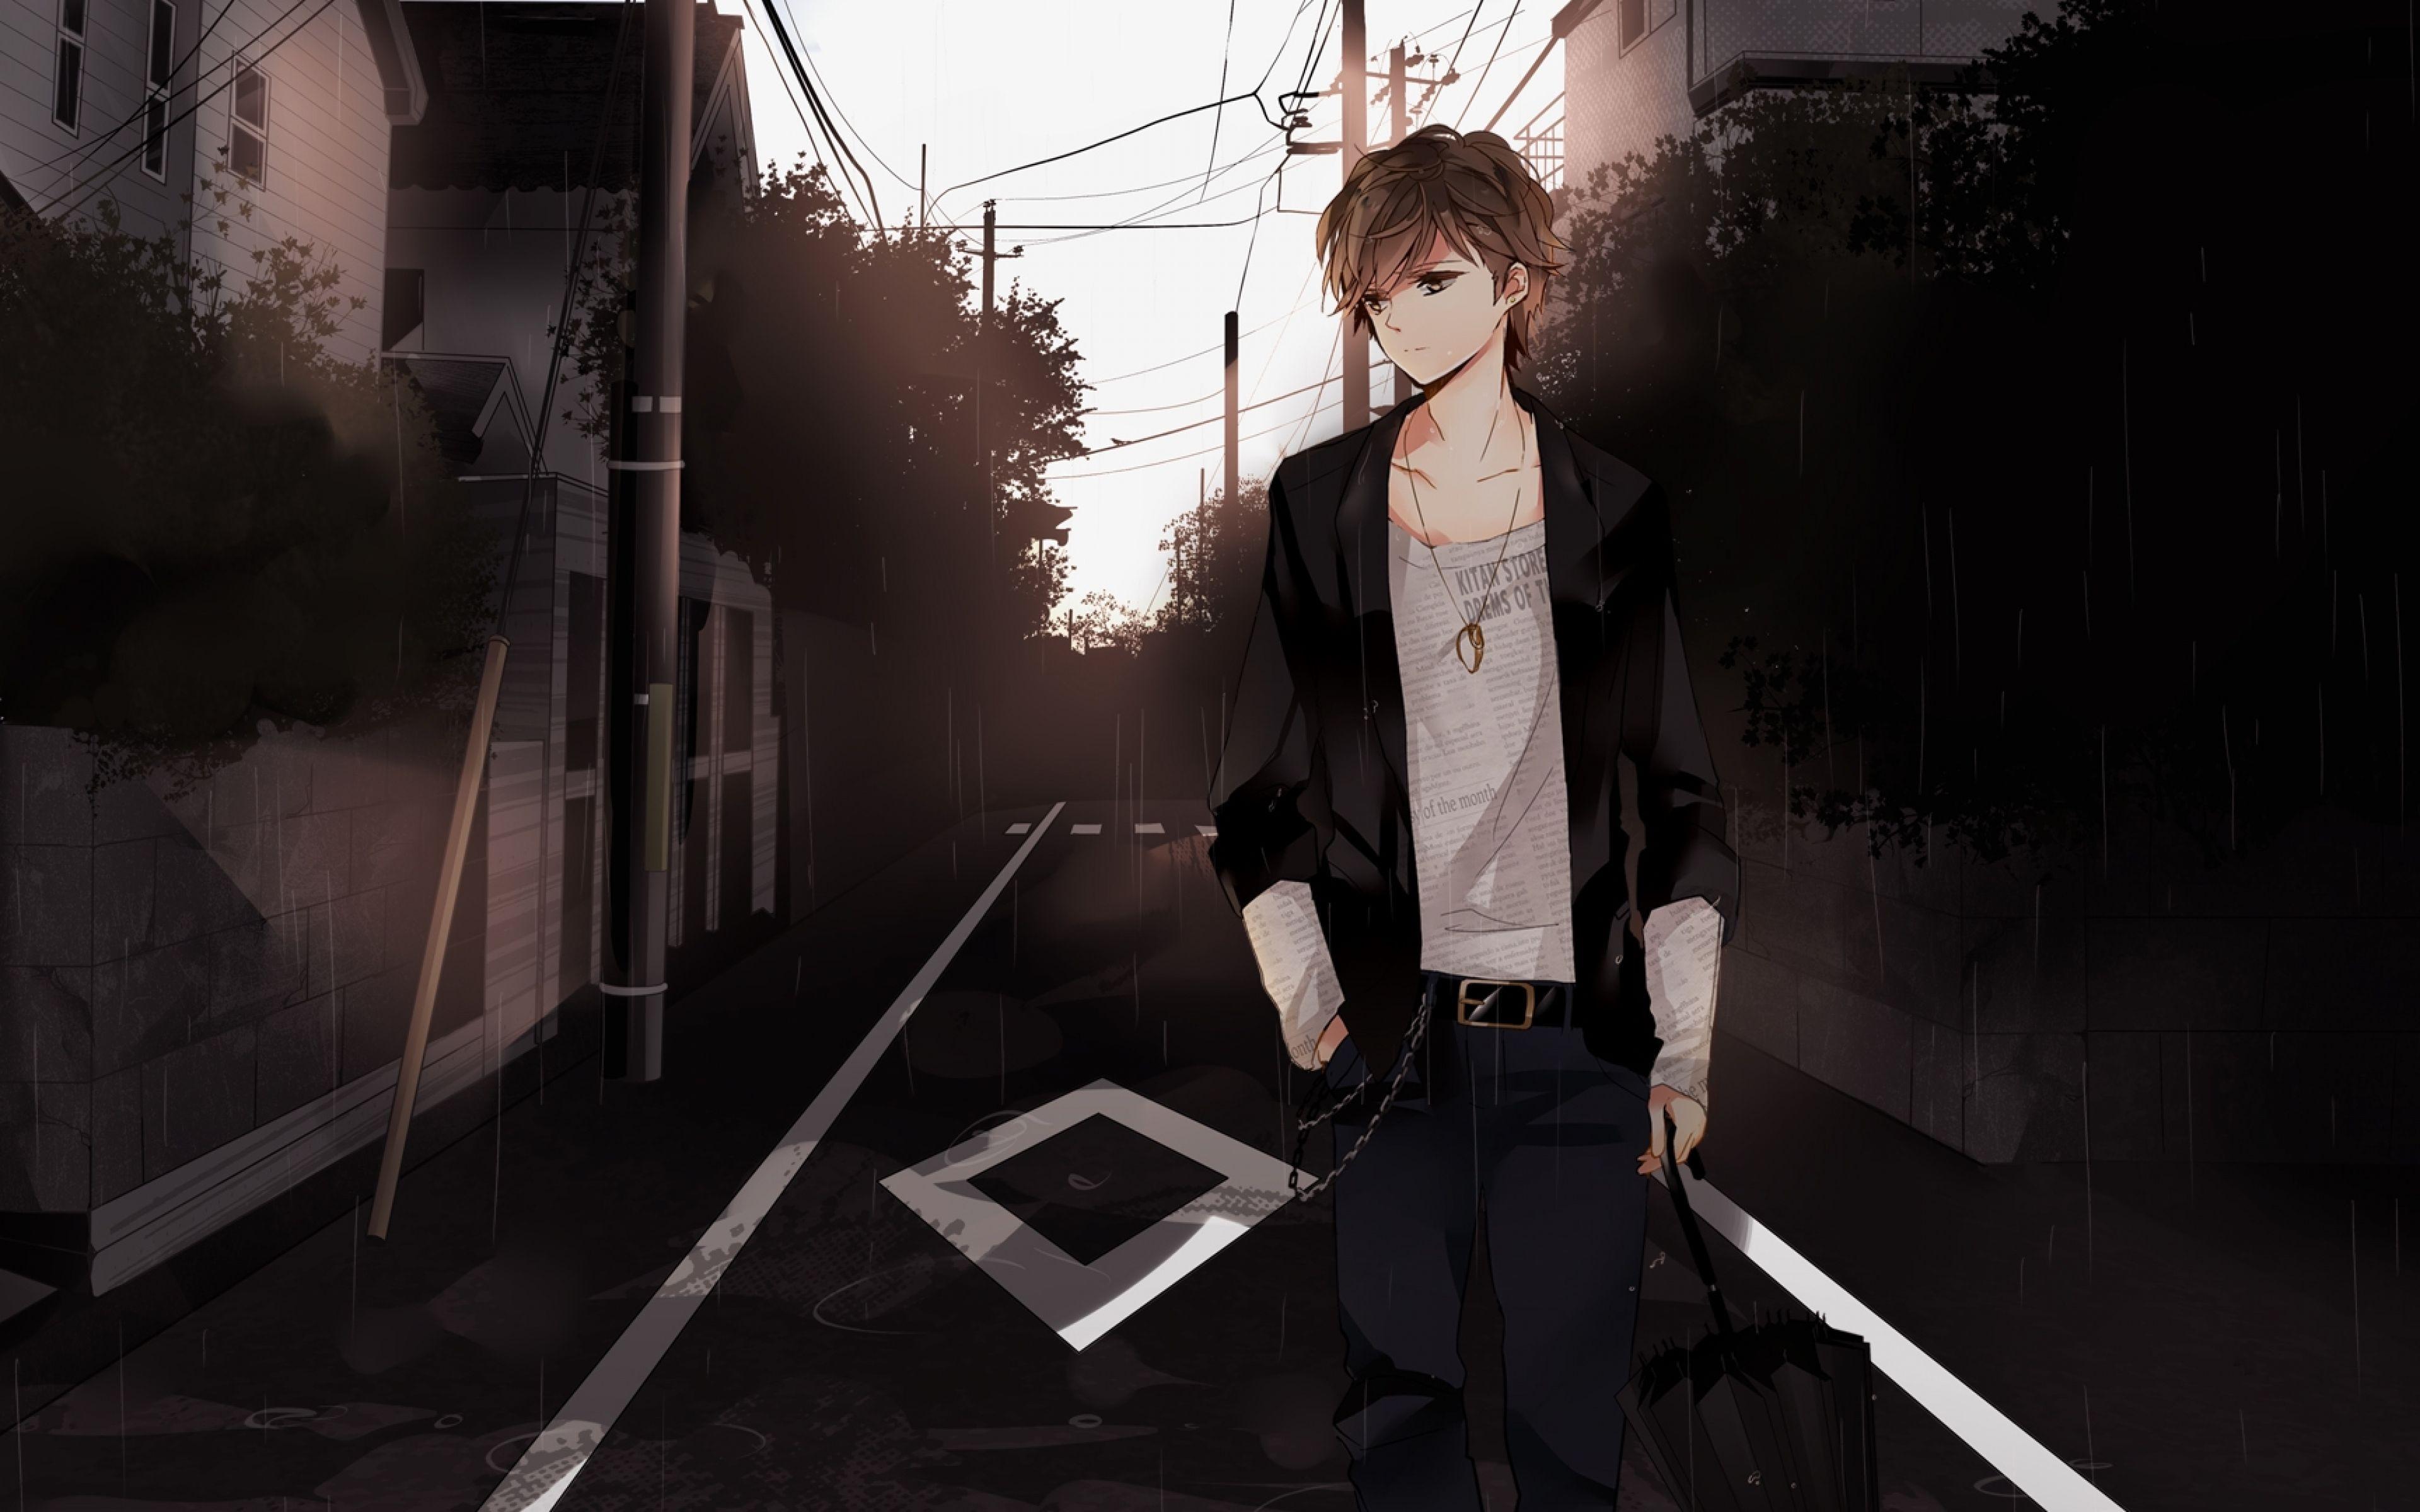 Aaron Somerwil Cute Anime Guys Anime Guys Anime Outfits